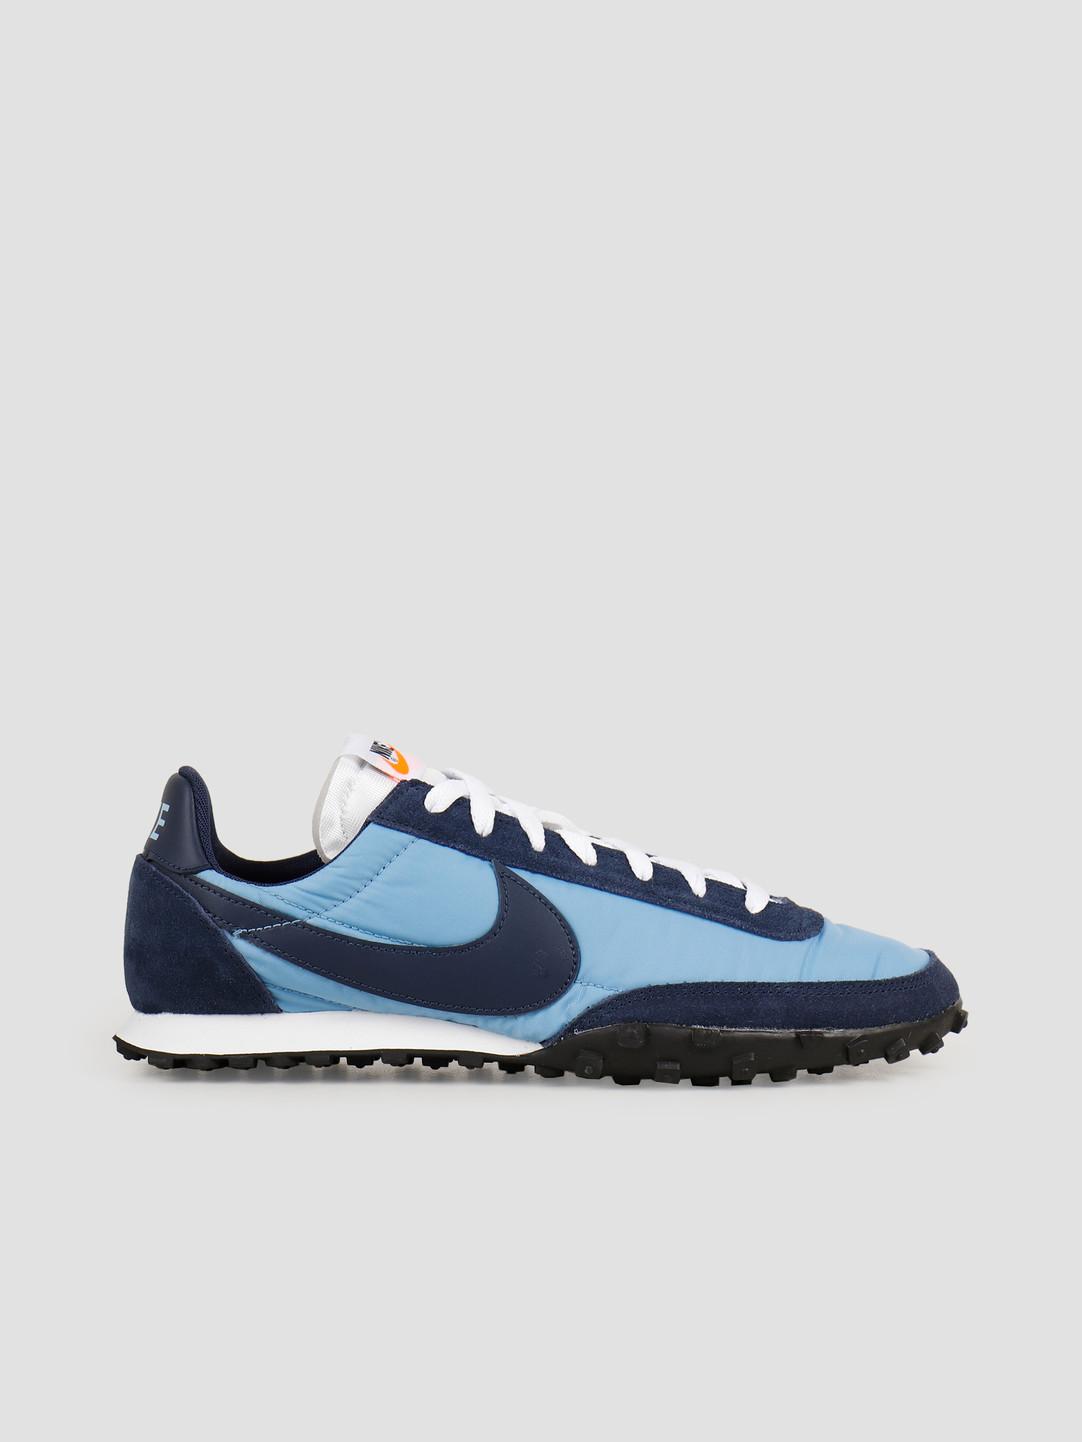 Nike Nike Waffle Racer Light Blue Midnight Navy Midnight Navy CN8115-400